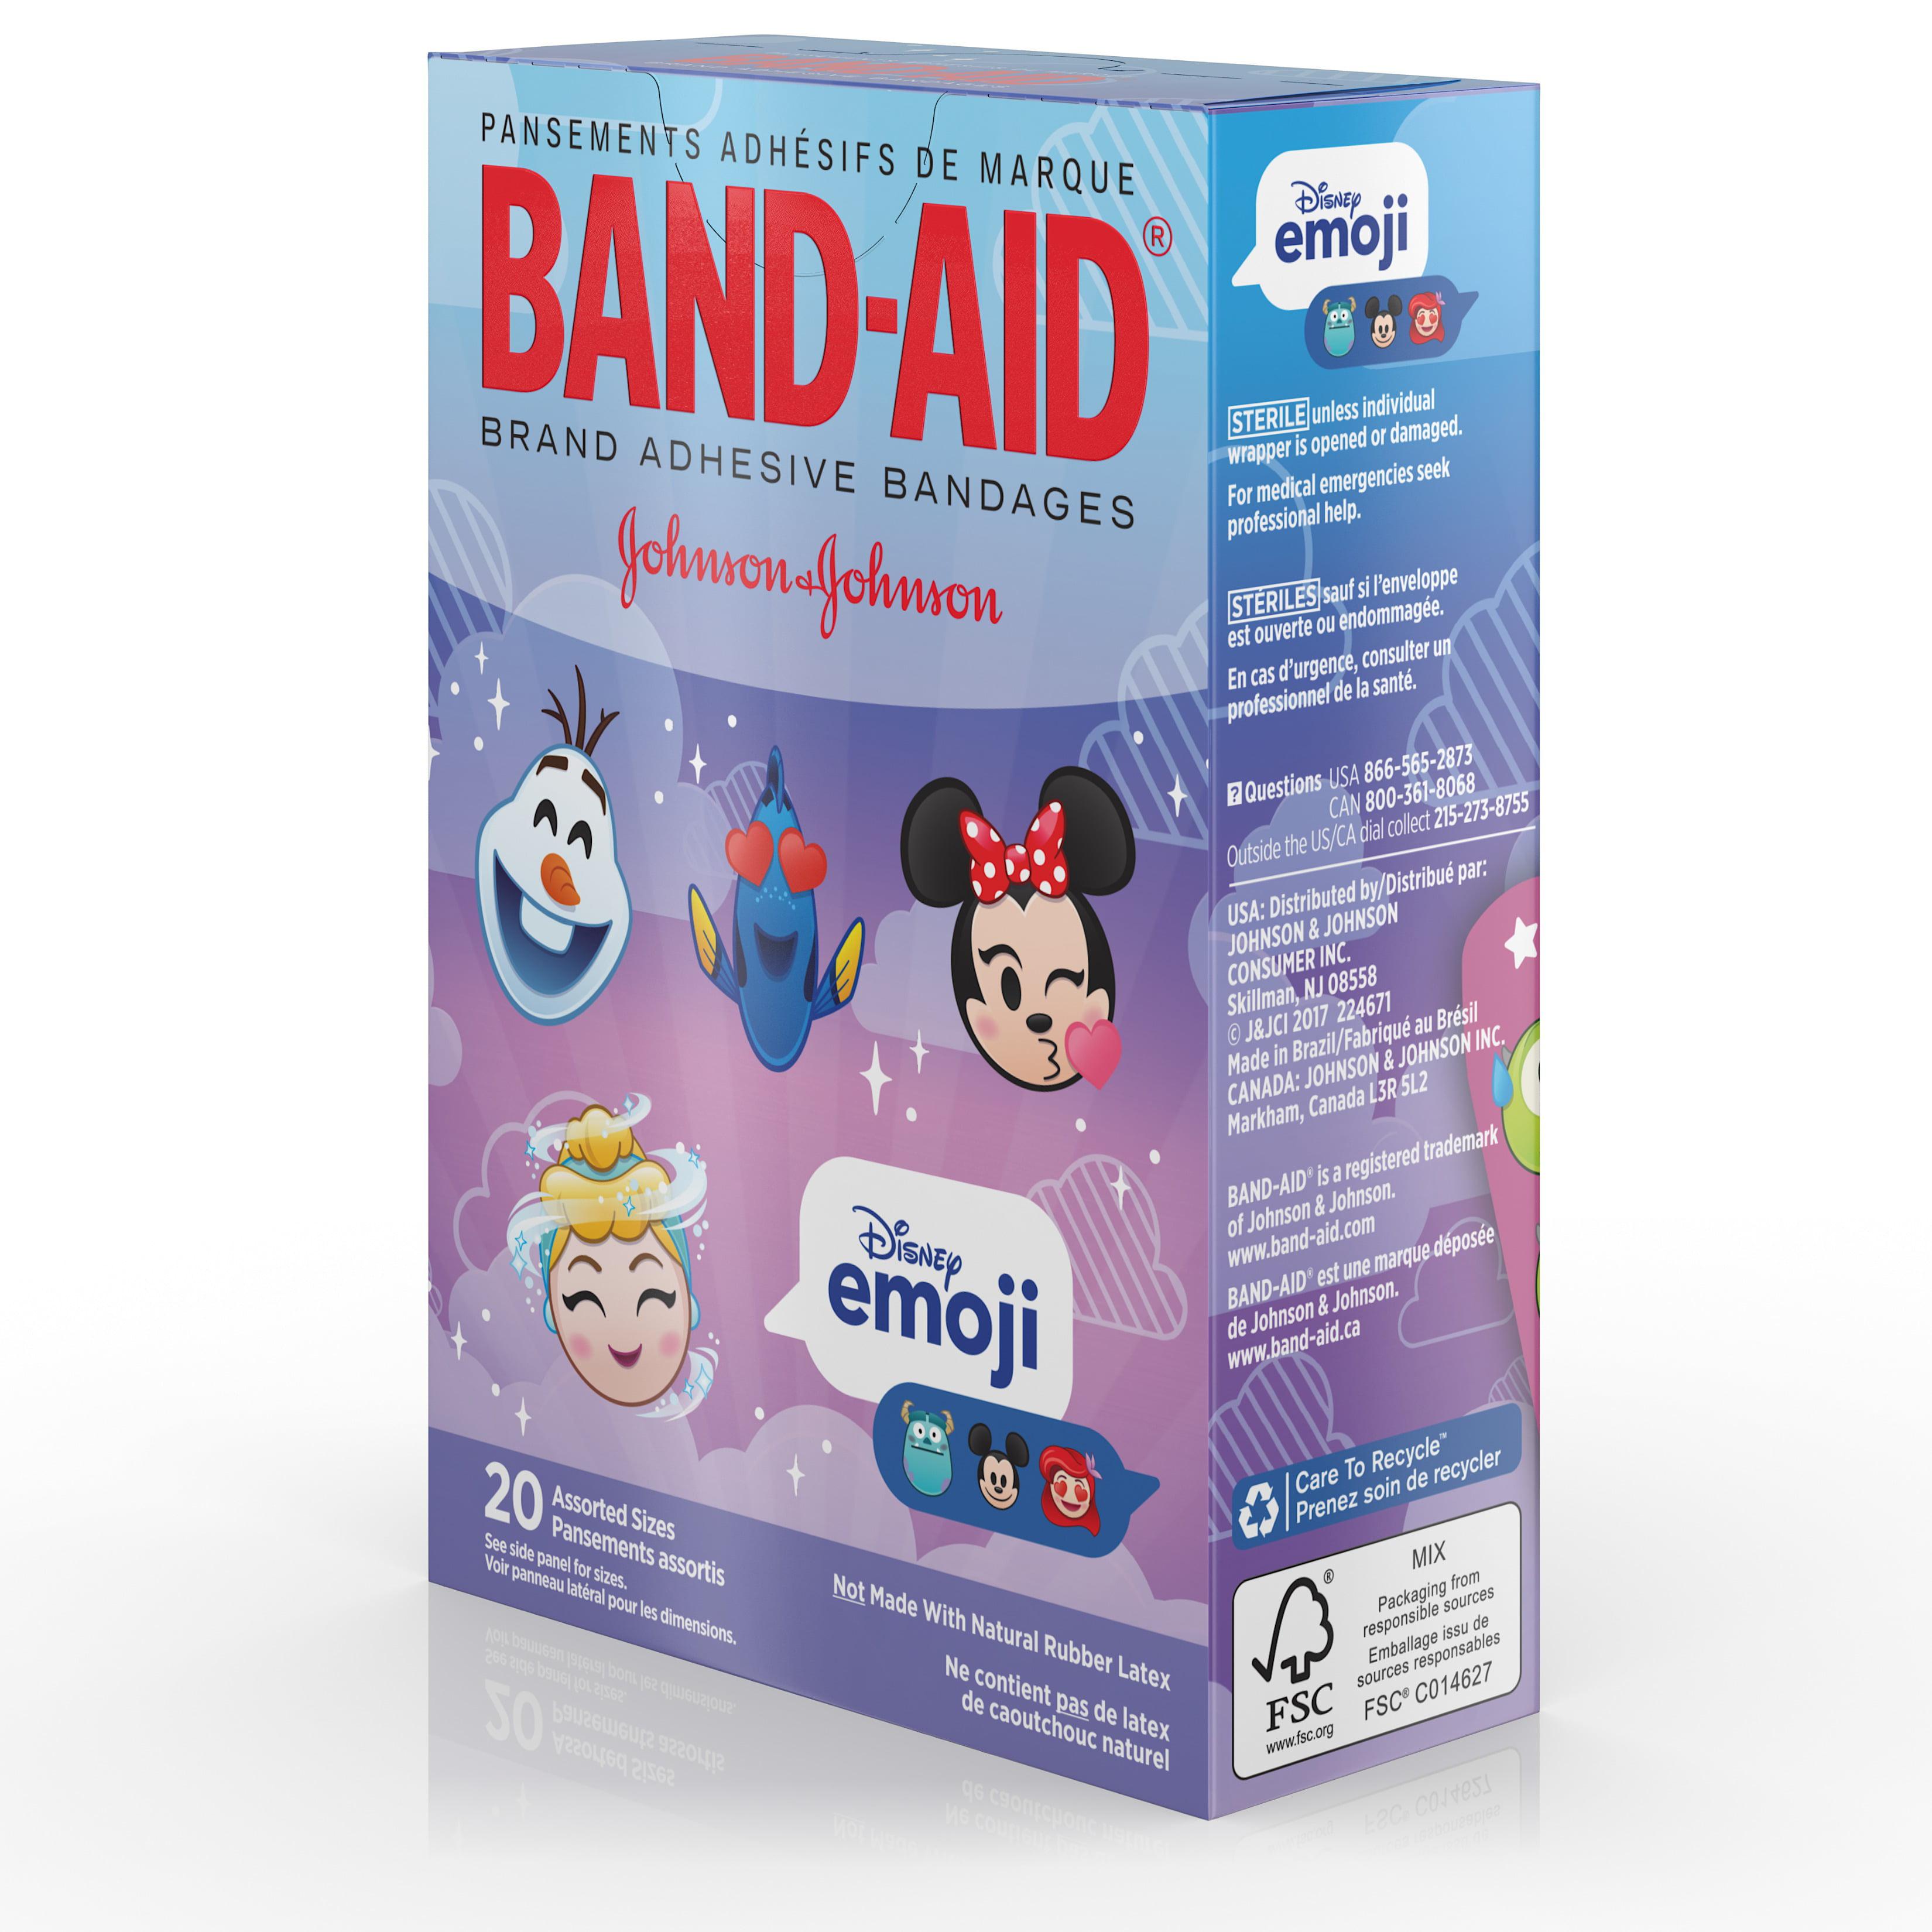 band aid adhesive bandages disney emoji characters assorted sizes